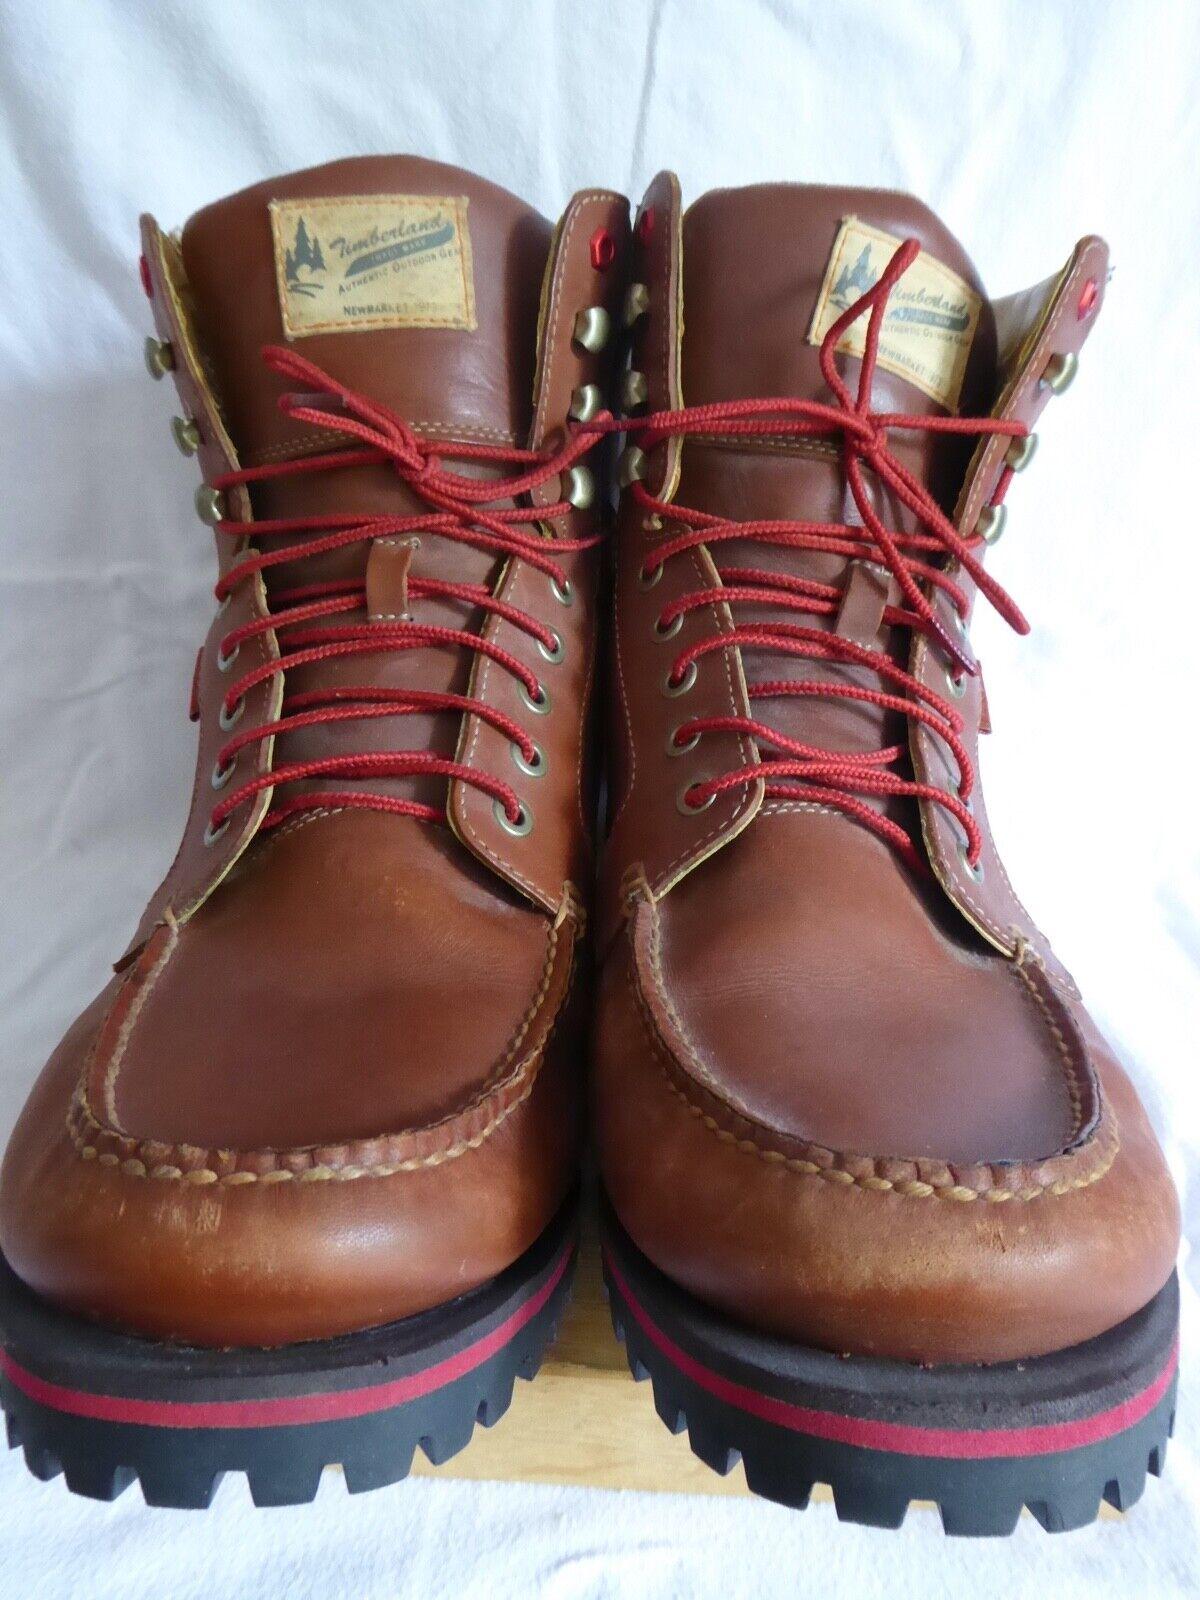 Timberland UK14.5 RRP EUC brown leather chukka boot - rare and unusual